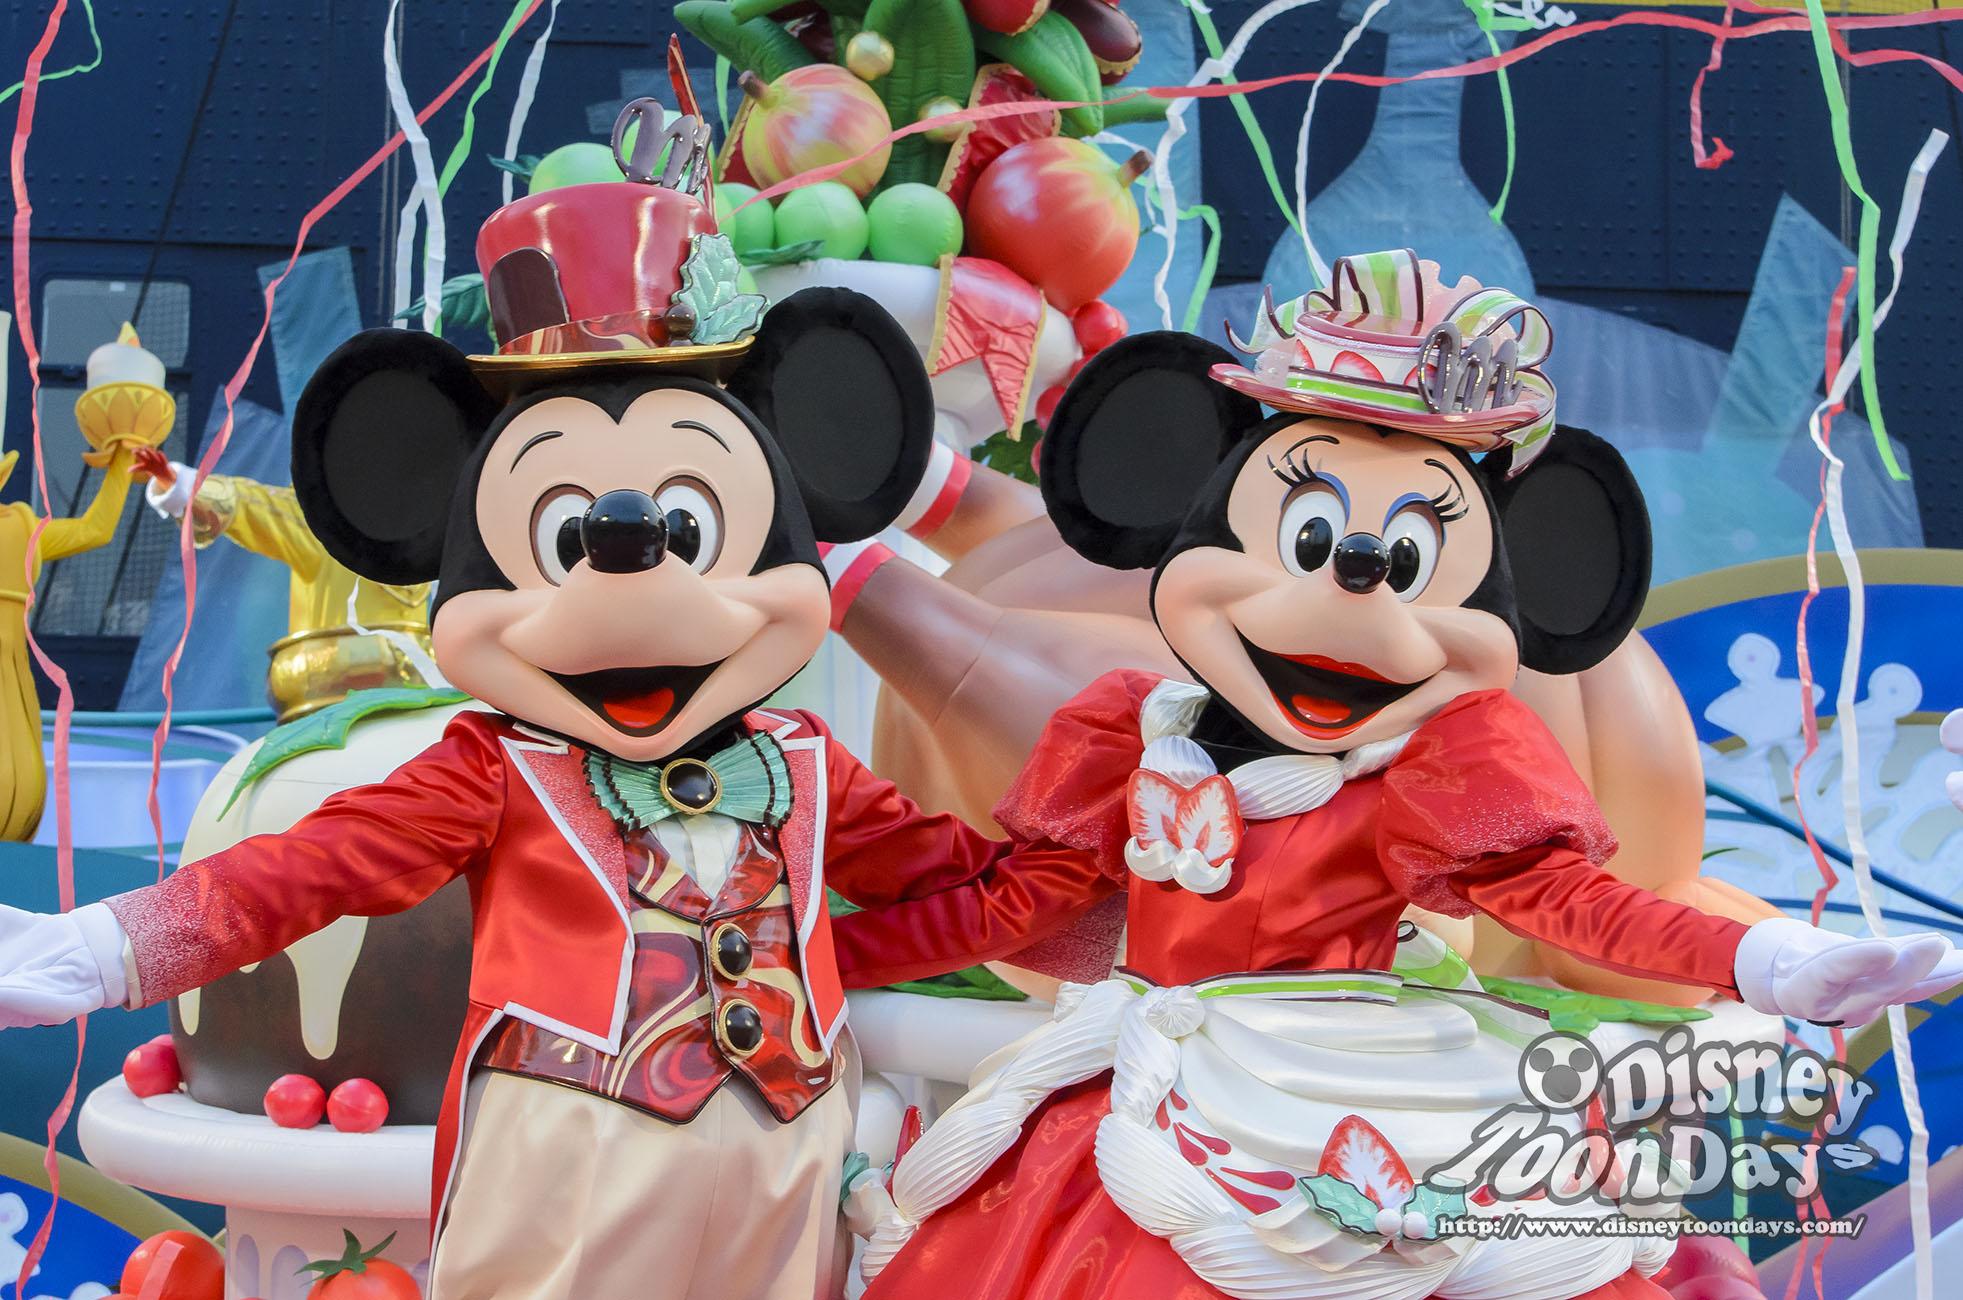 TDS クリスマス・ウィッシュ テーブルイズウェイティング クリスマスキュイジーヌ ミッキーマウス ミニーマウス